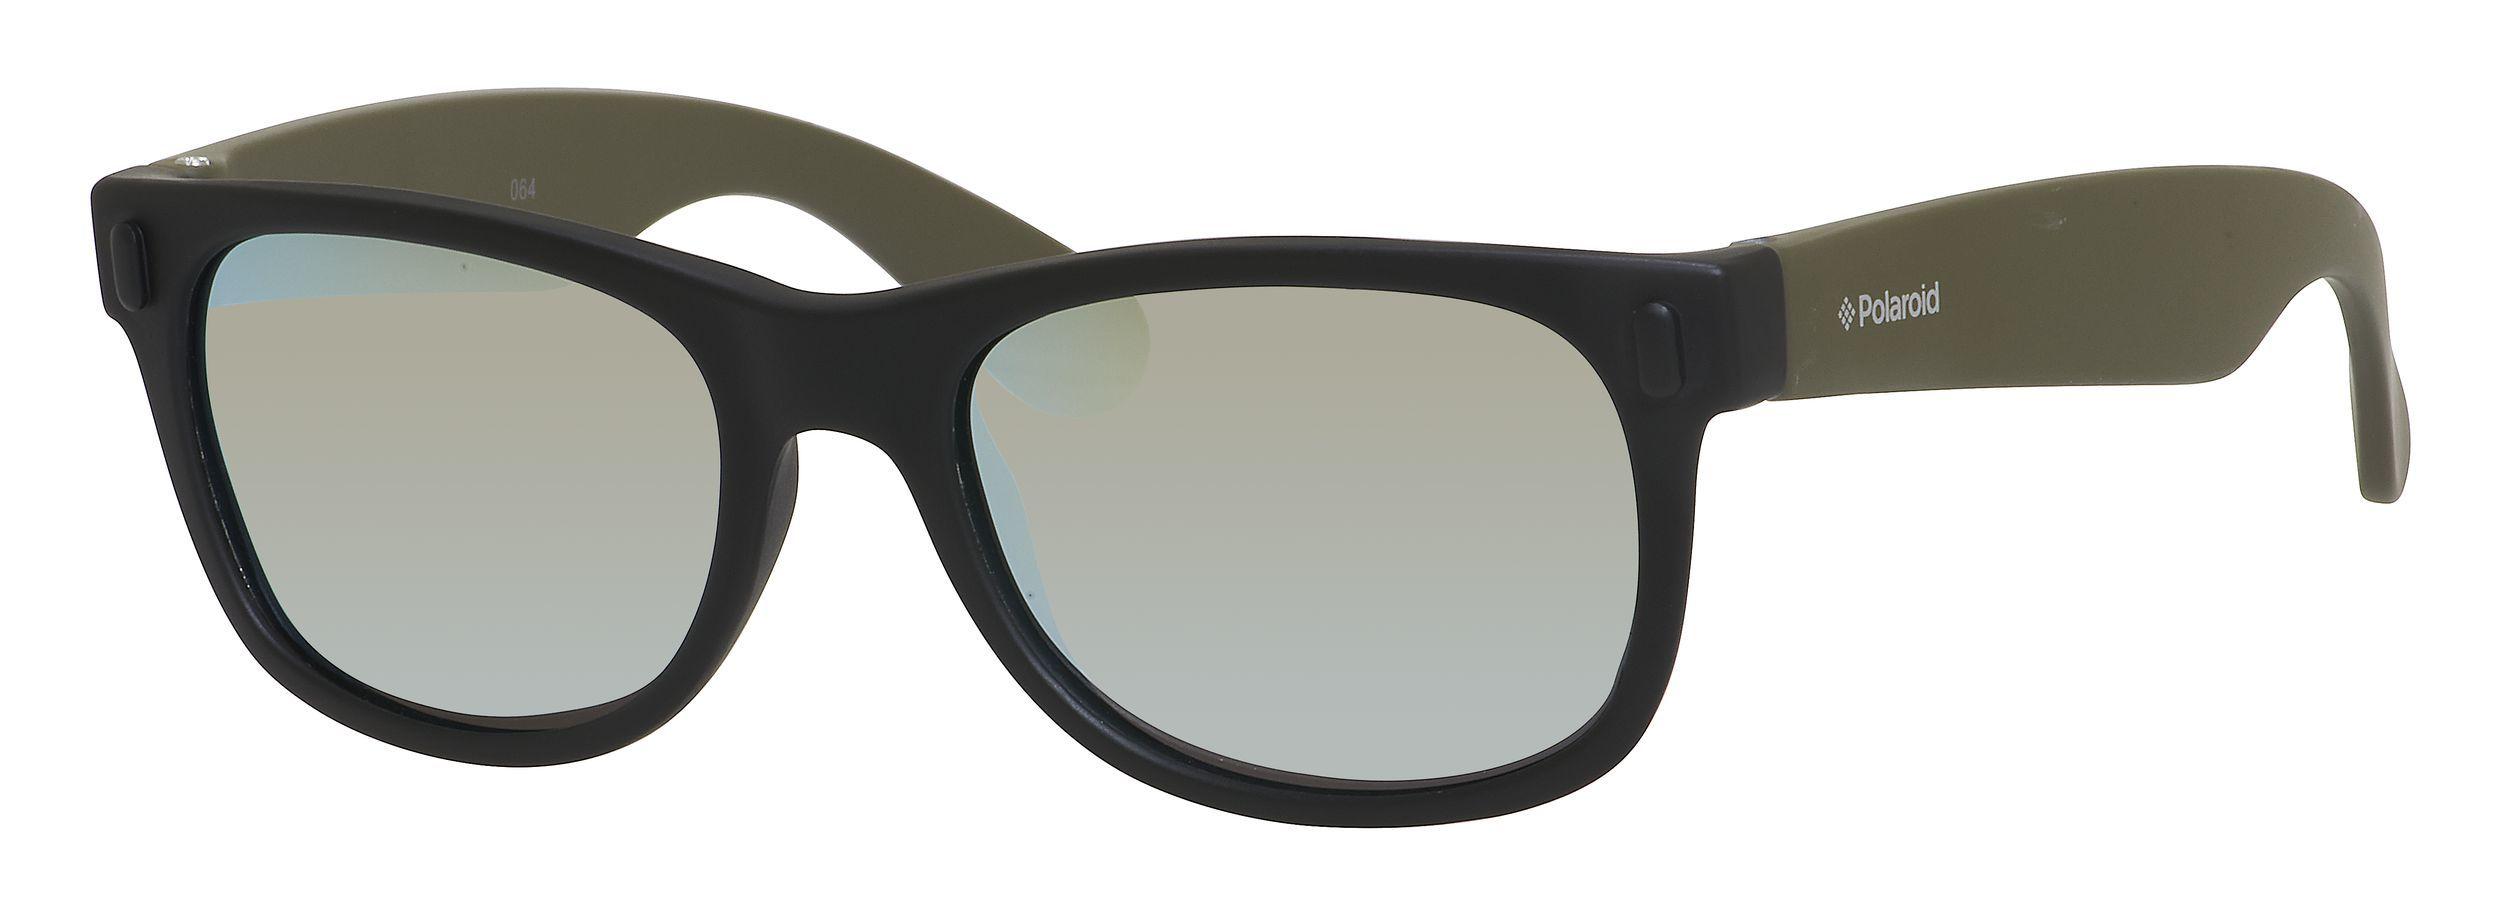 Polaroid Kids P 0115 S Sunglasses Polarized Black Khaki 0tcg Jb Babiators True Blue Classic Ages 3 7 Optiwow